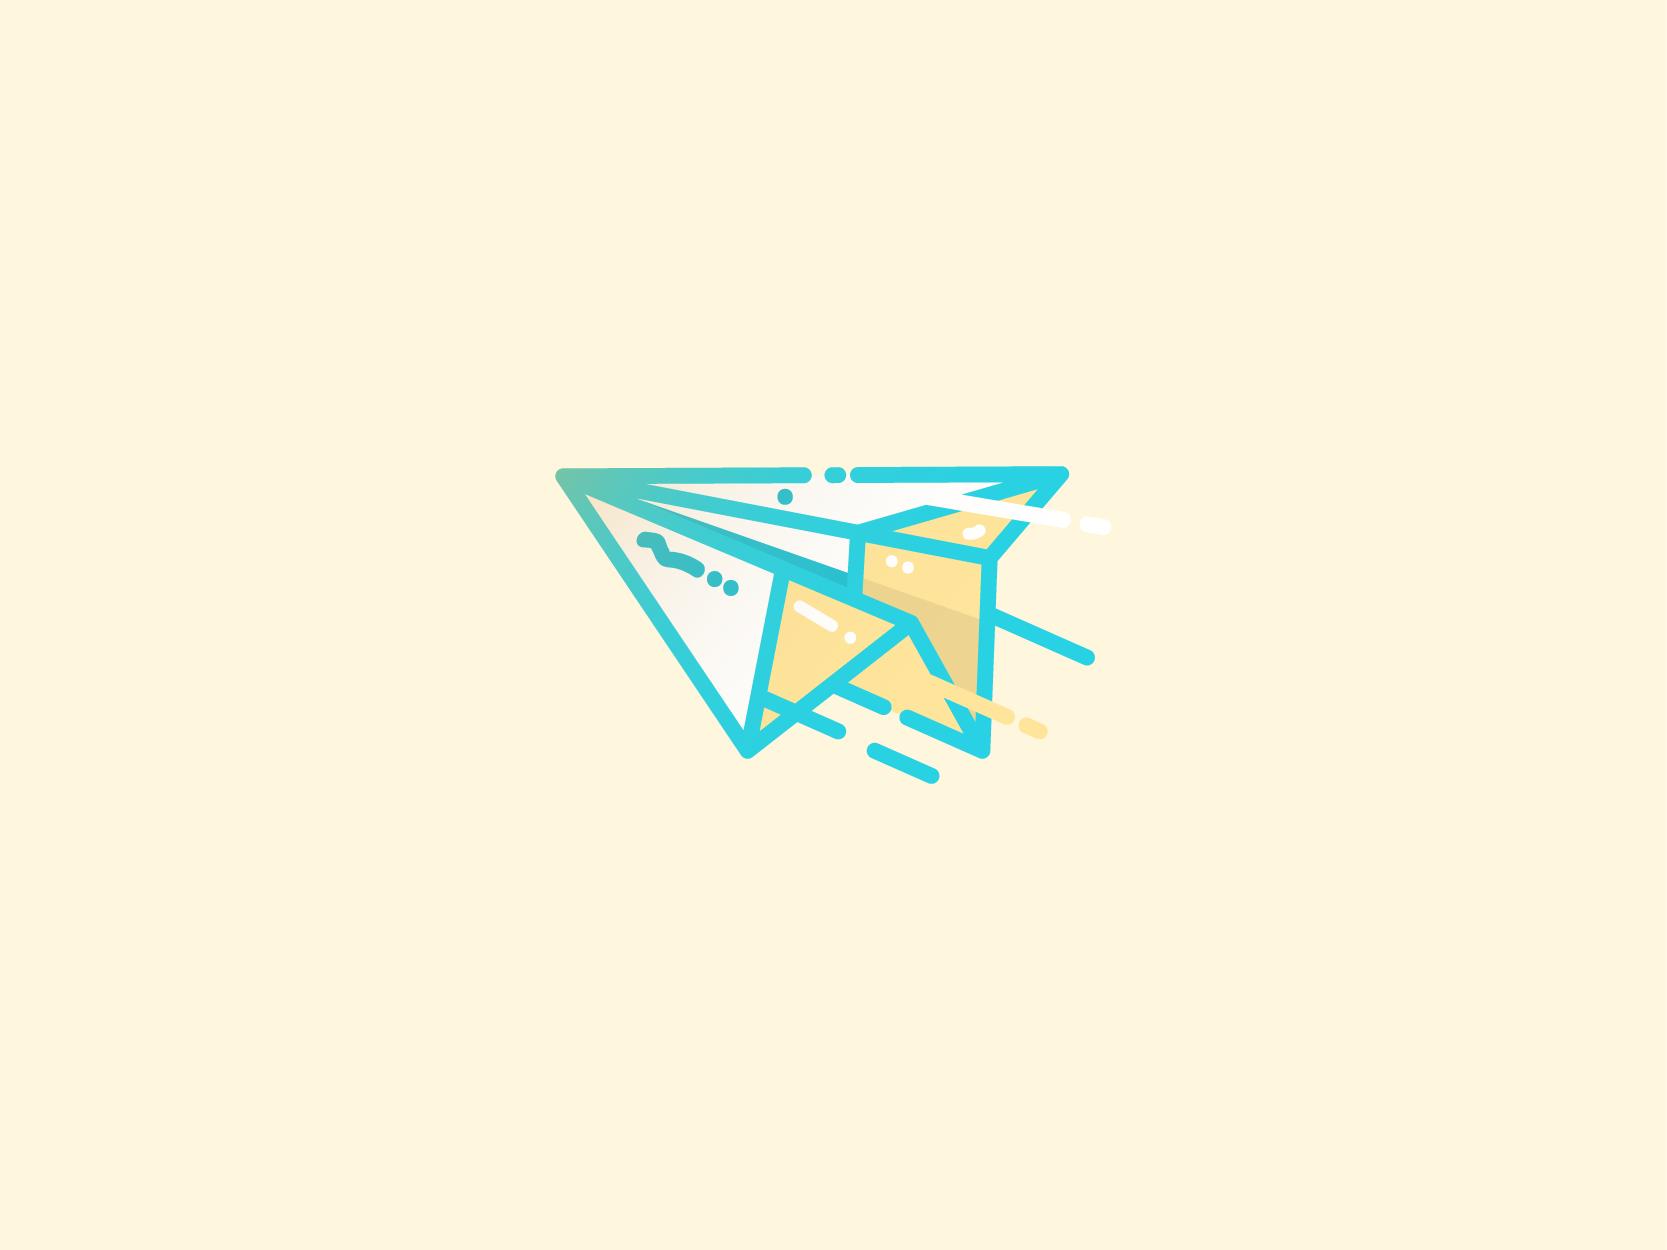 11 paperplane